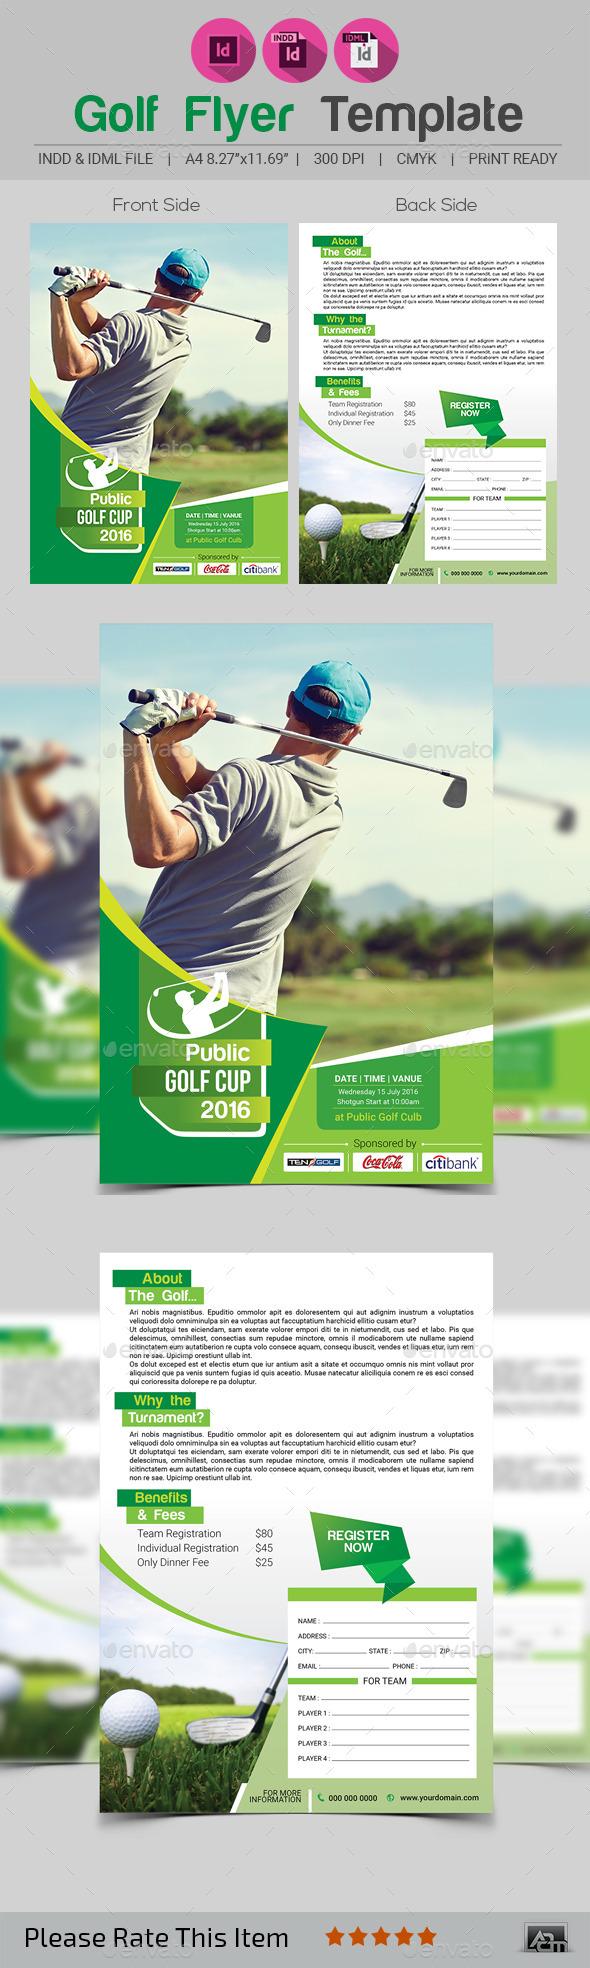 GraphicRiver Golf Flyer Template V2 11943569